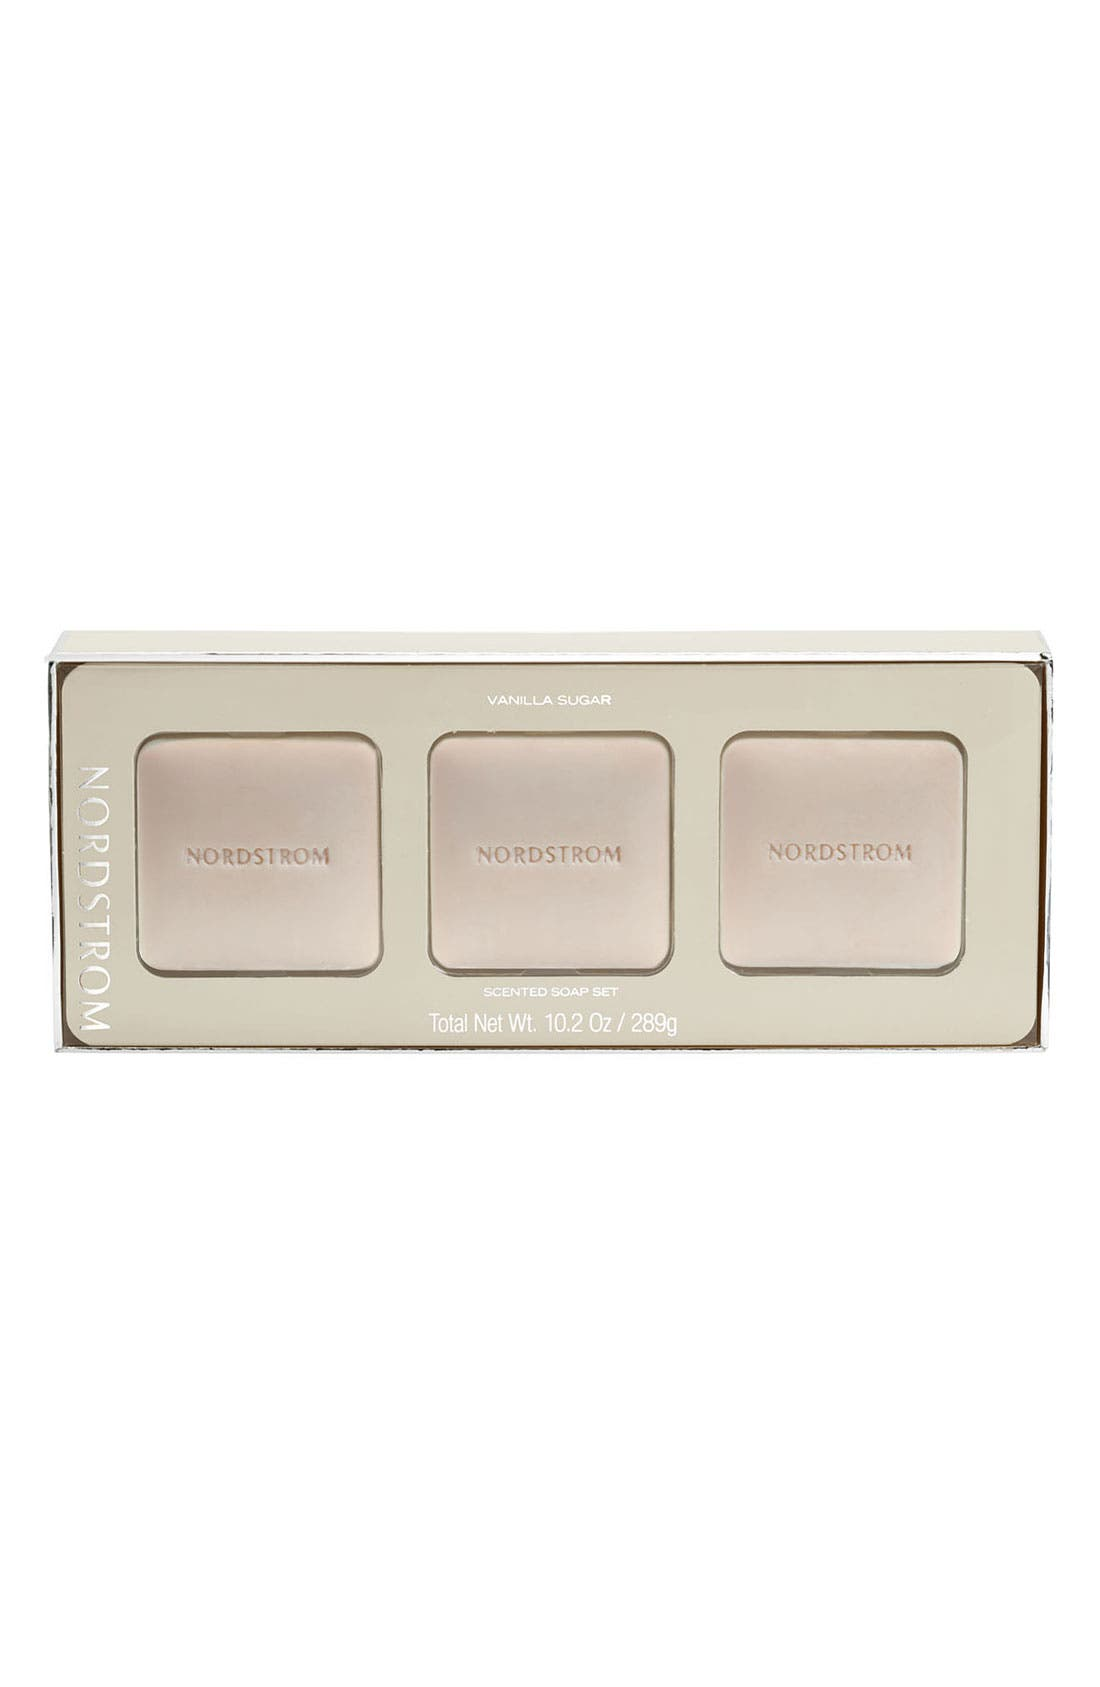 Main Image - Nordstrom 'Vanilla Sugar' Scented Soap Set